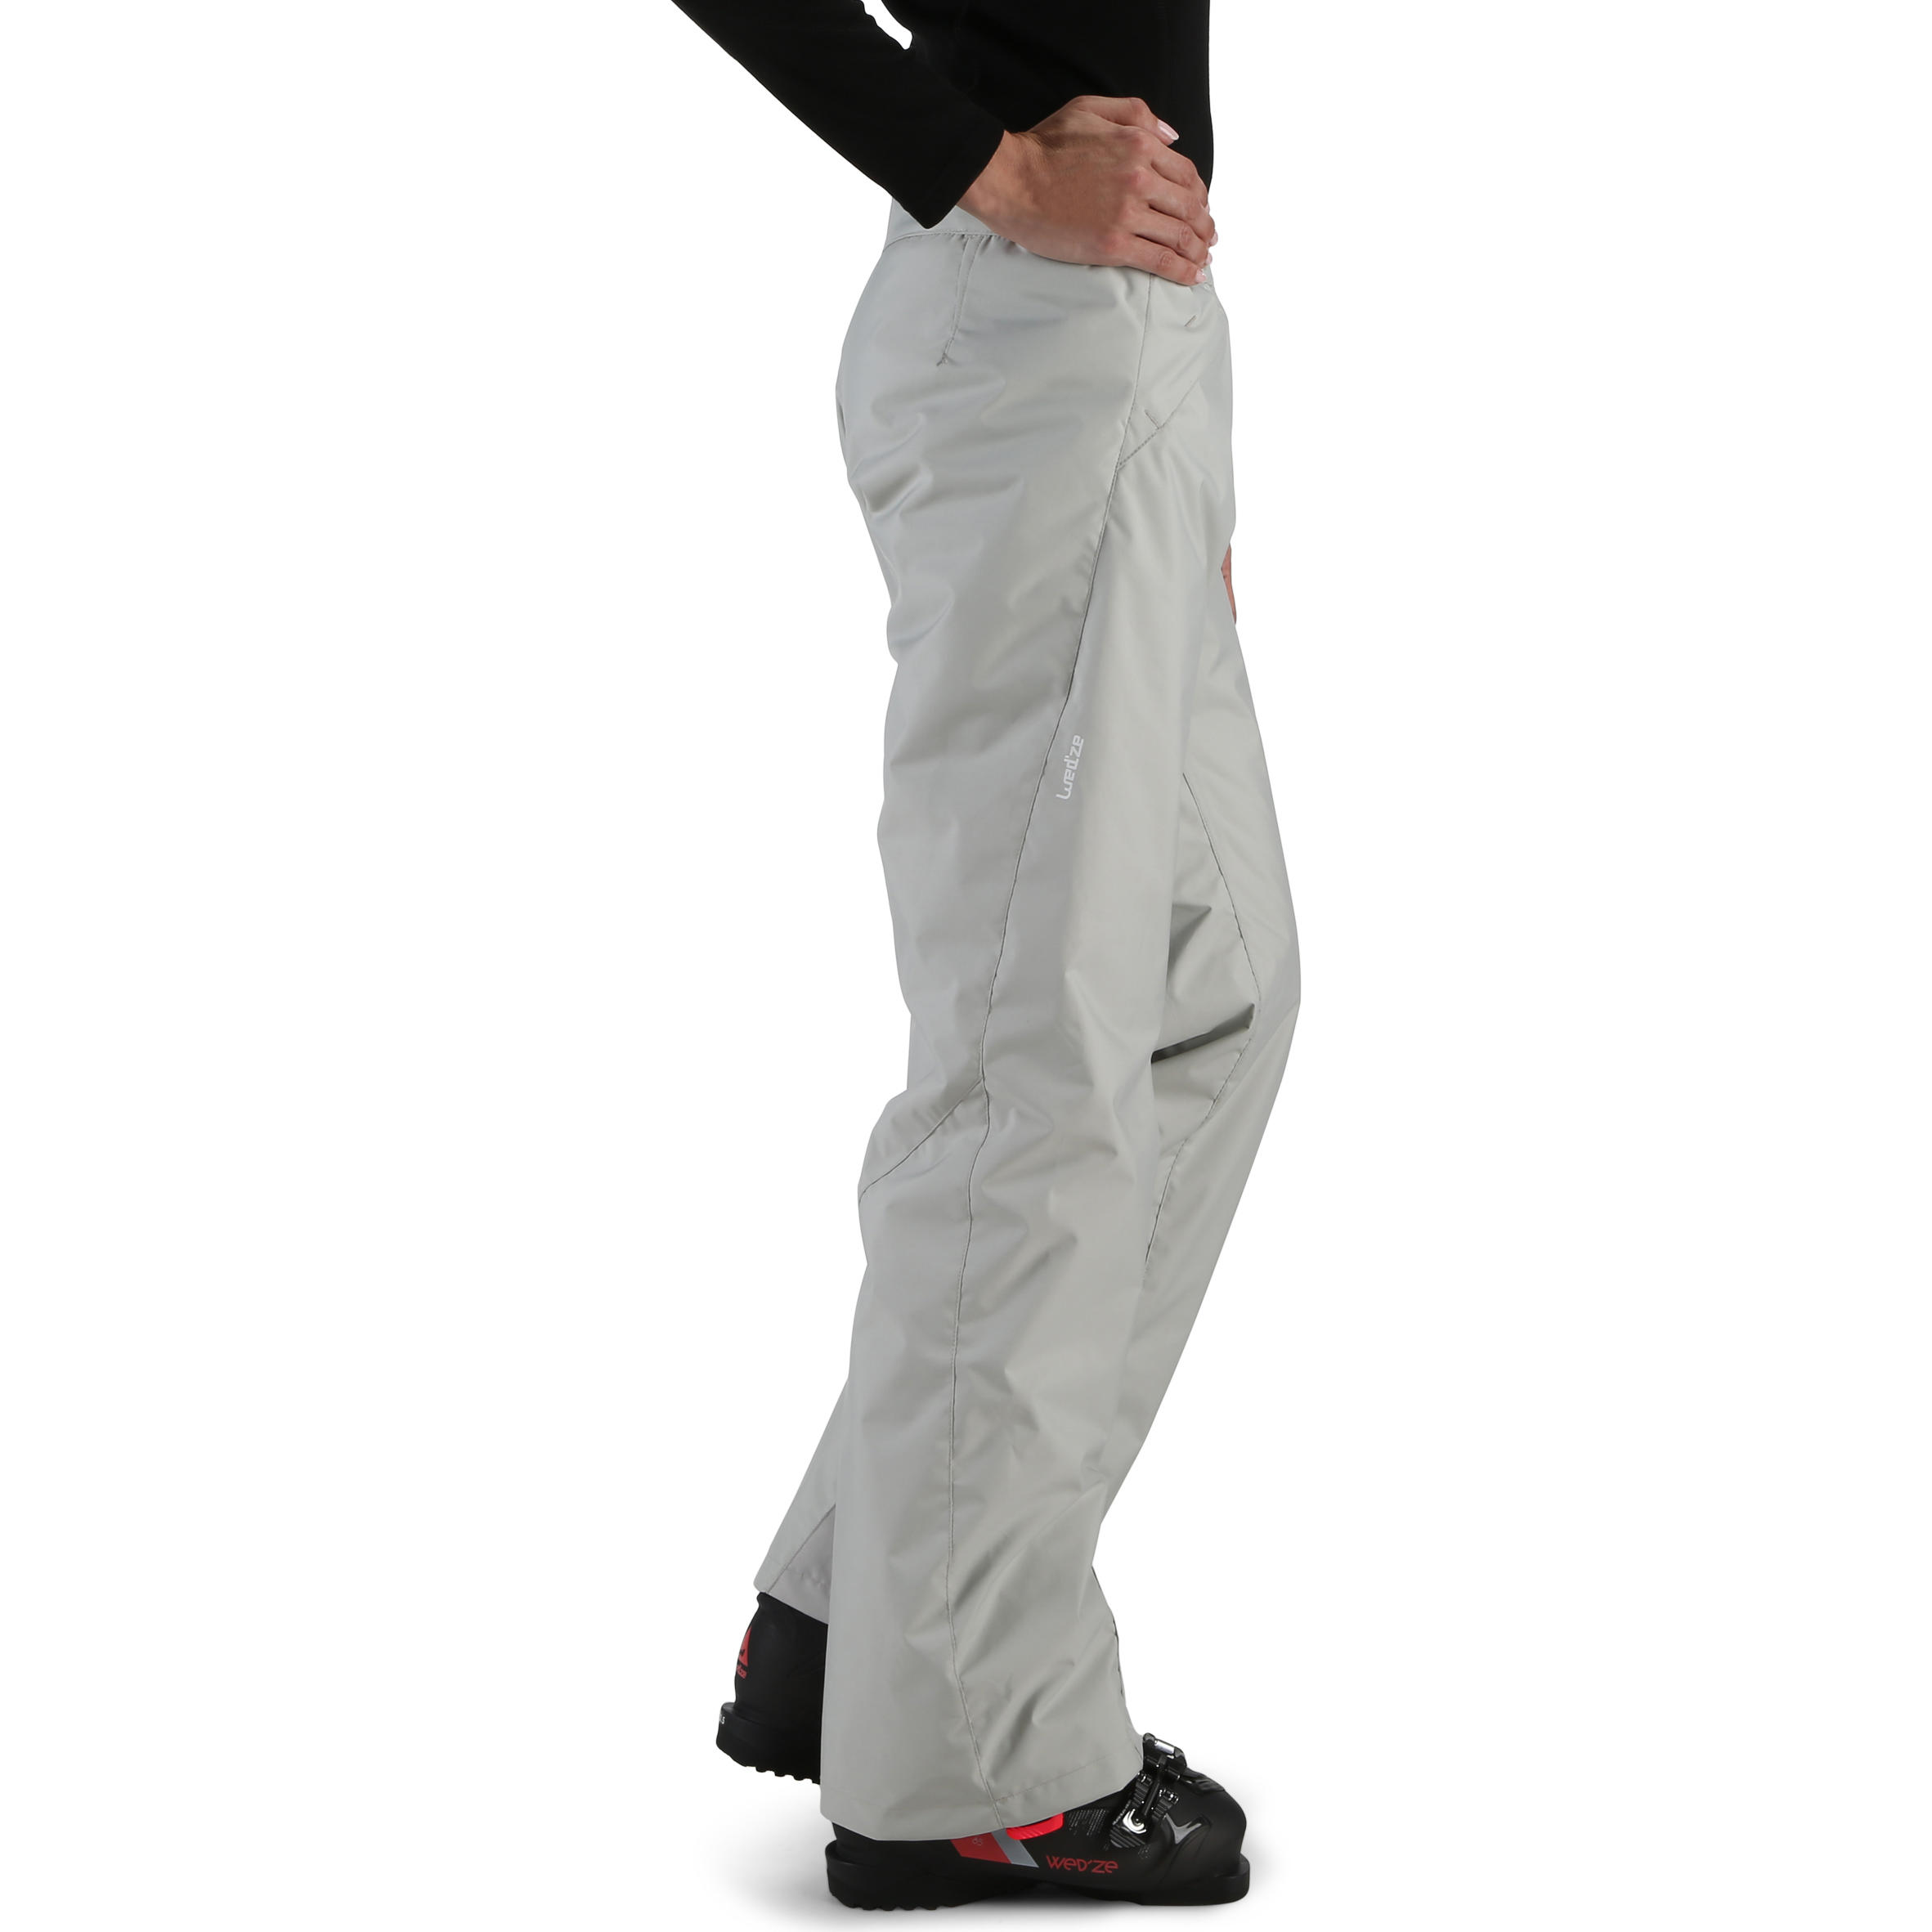 Ski-P 100 Women's Piste Skiing Trousers - Grey